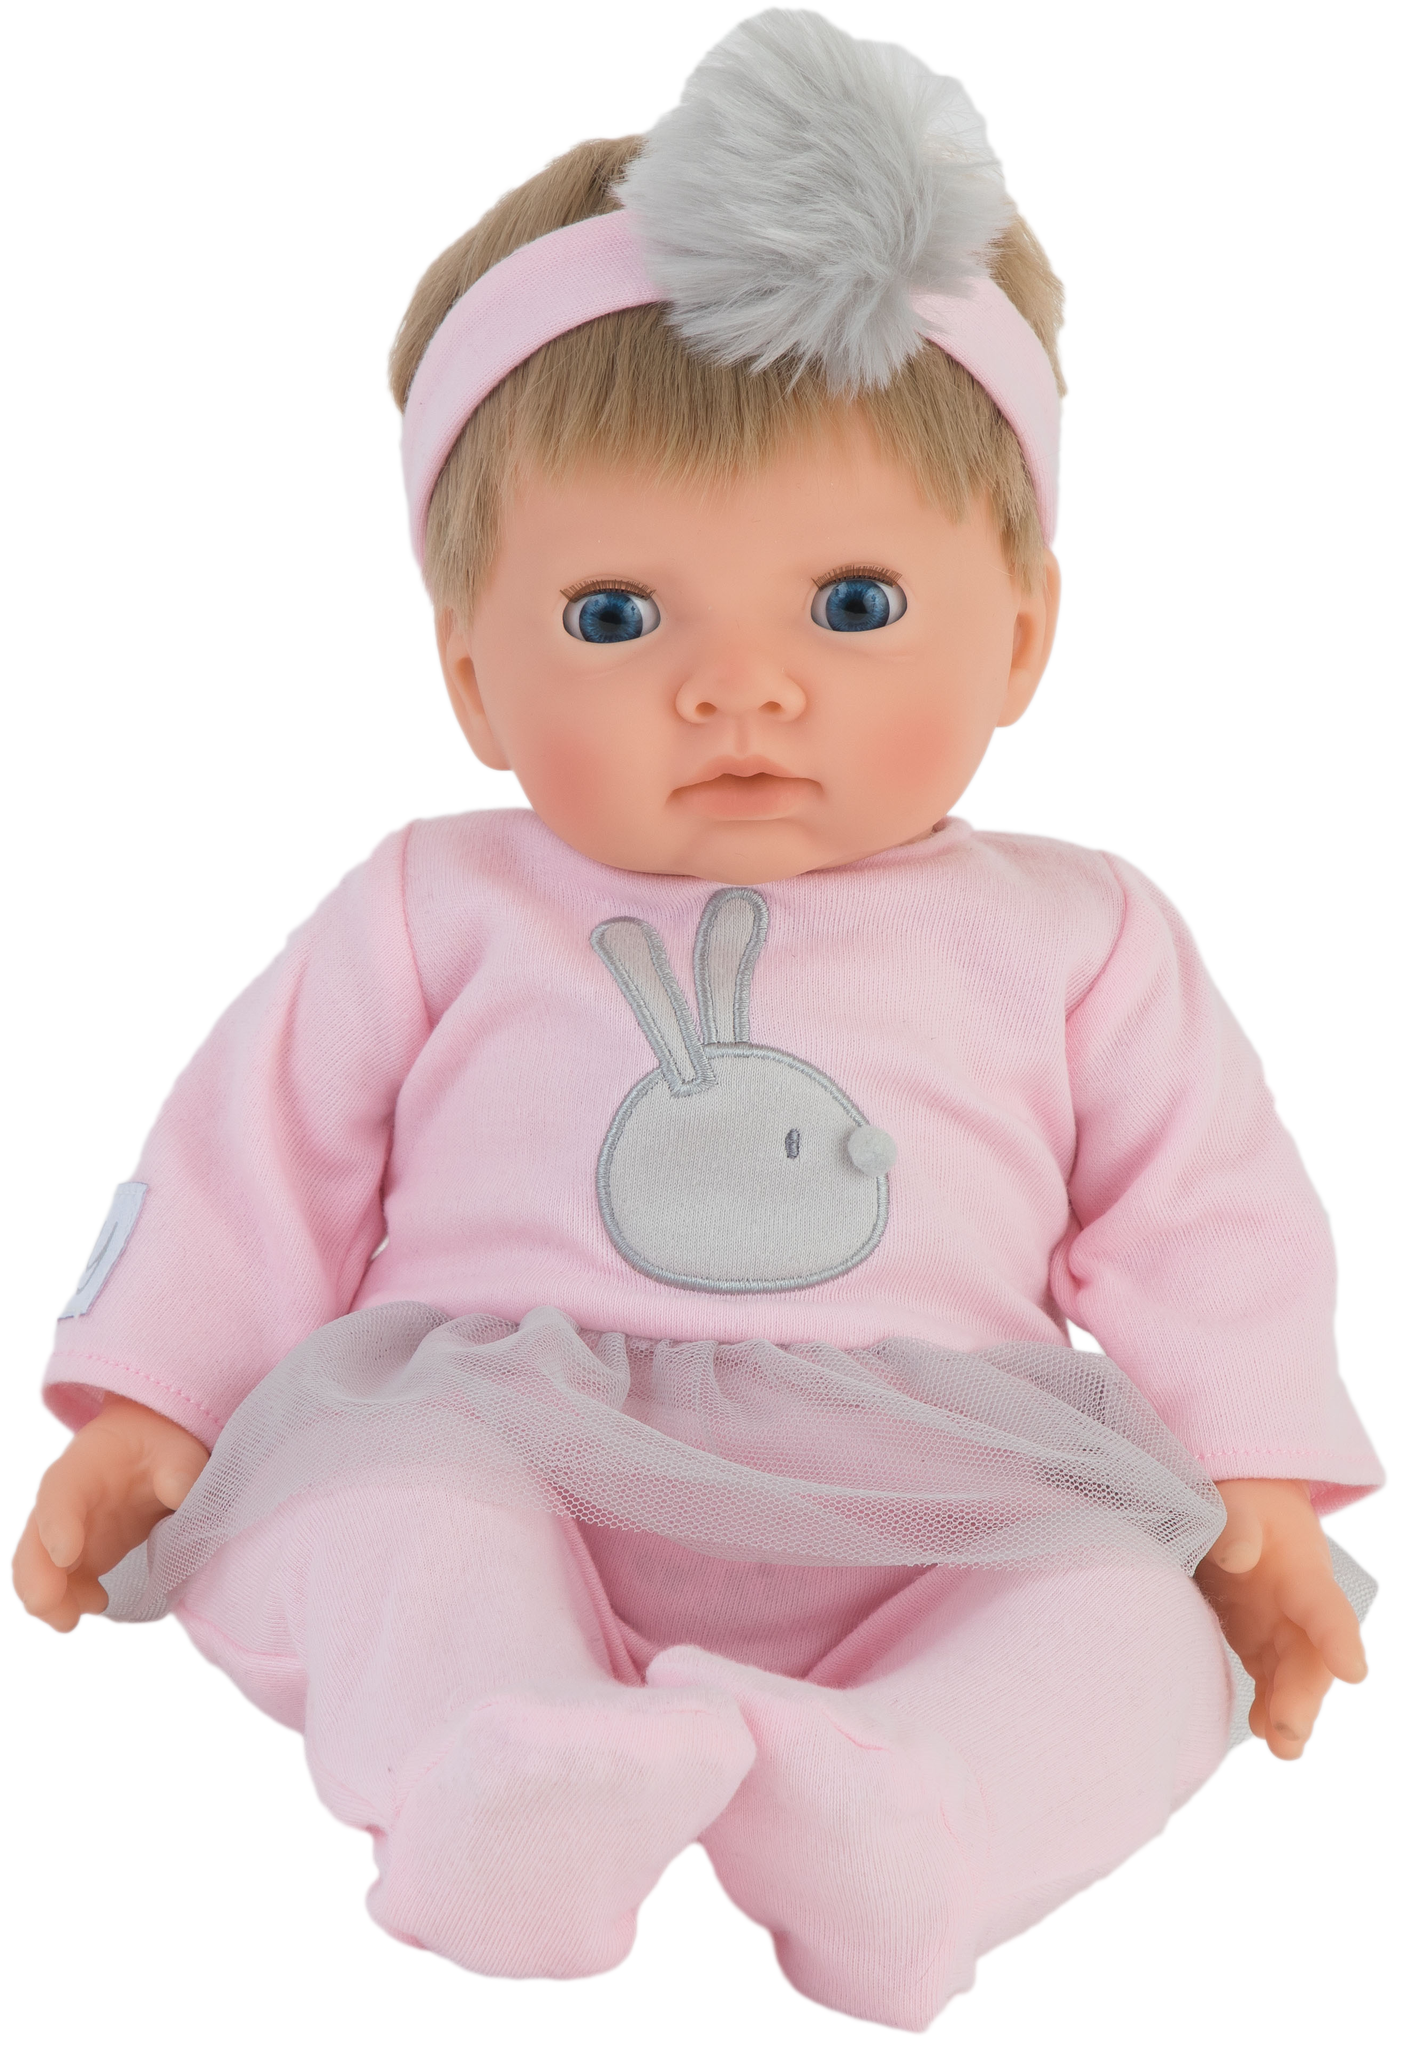 Tiny Treasure - Doll w/Blond Hair & Pink Pom-Pom Outfit (30138)